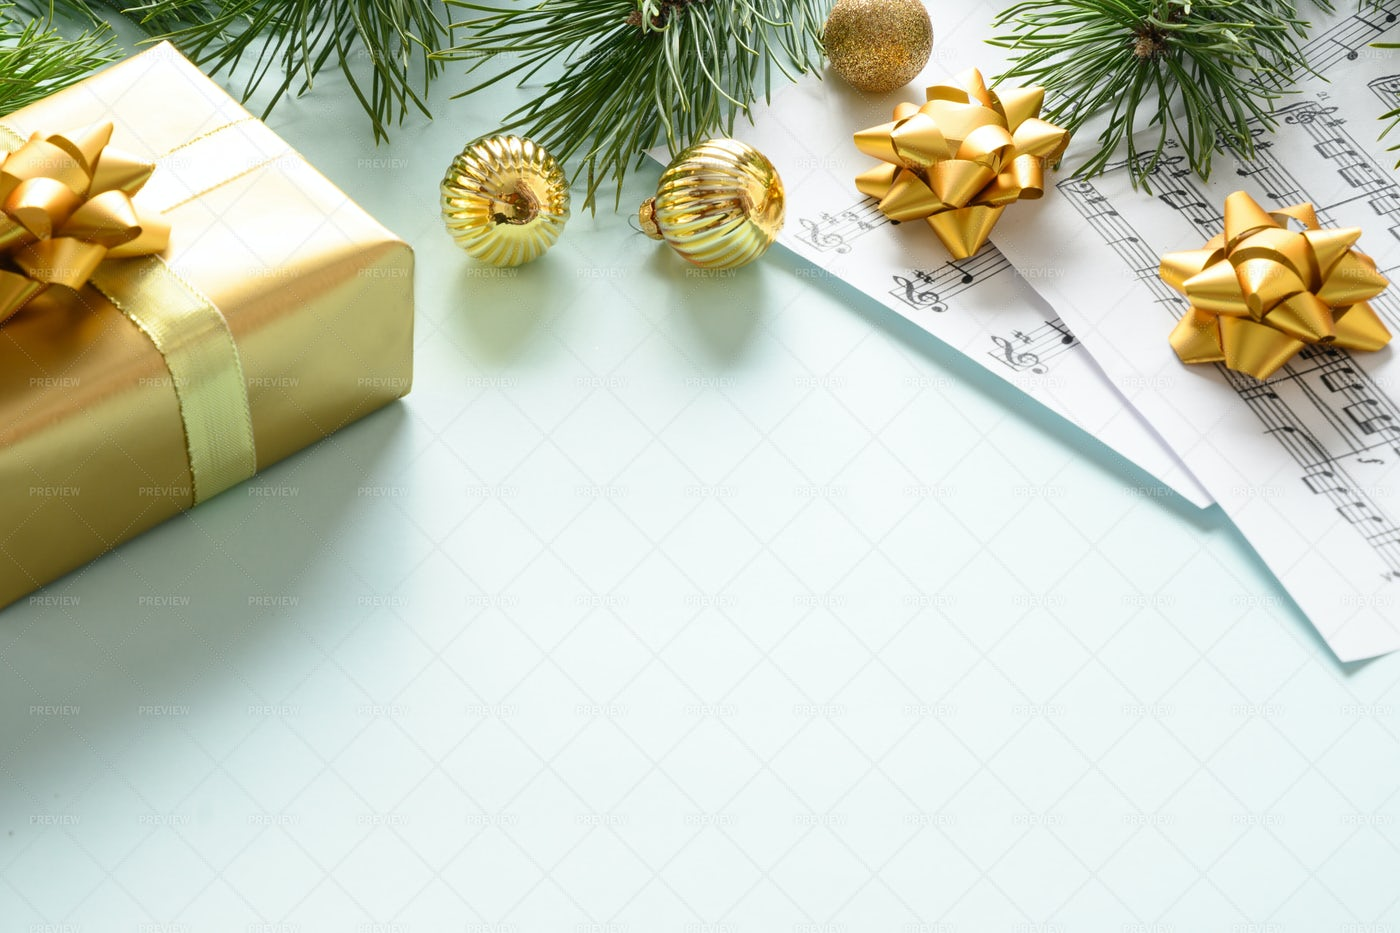 Music Sheets For Christmas Carols: Stock Photos